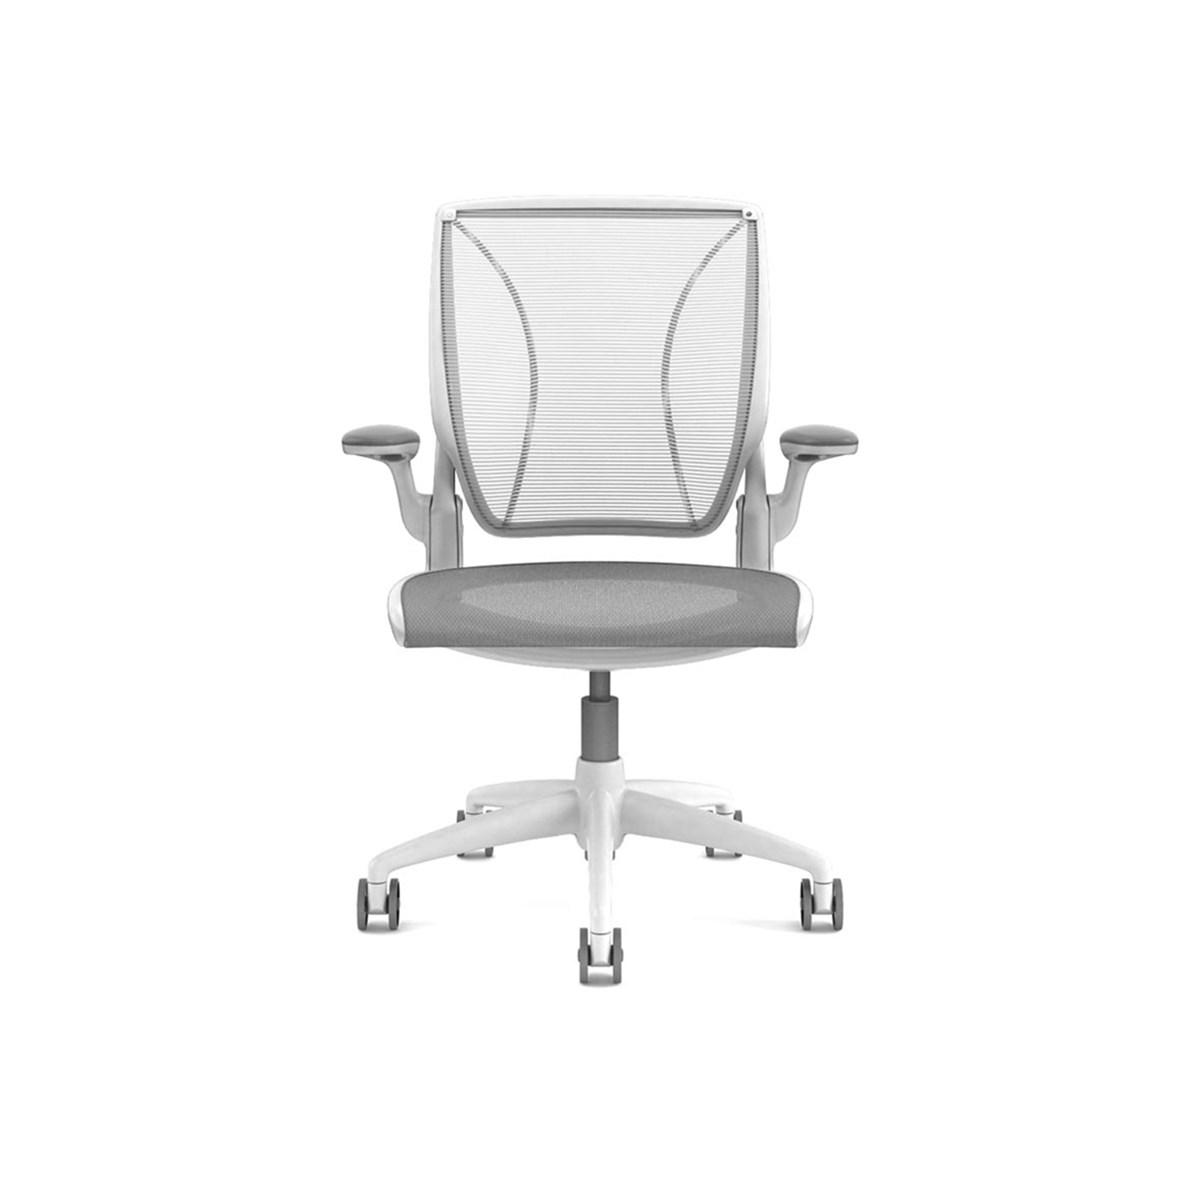 Humanscale-Niels-Diffrient-World-Task-Chair-Matisse-1